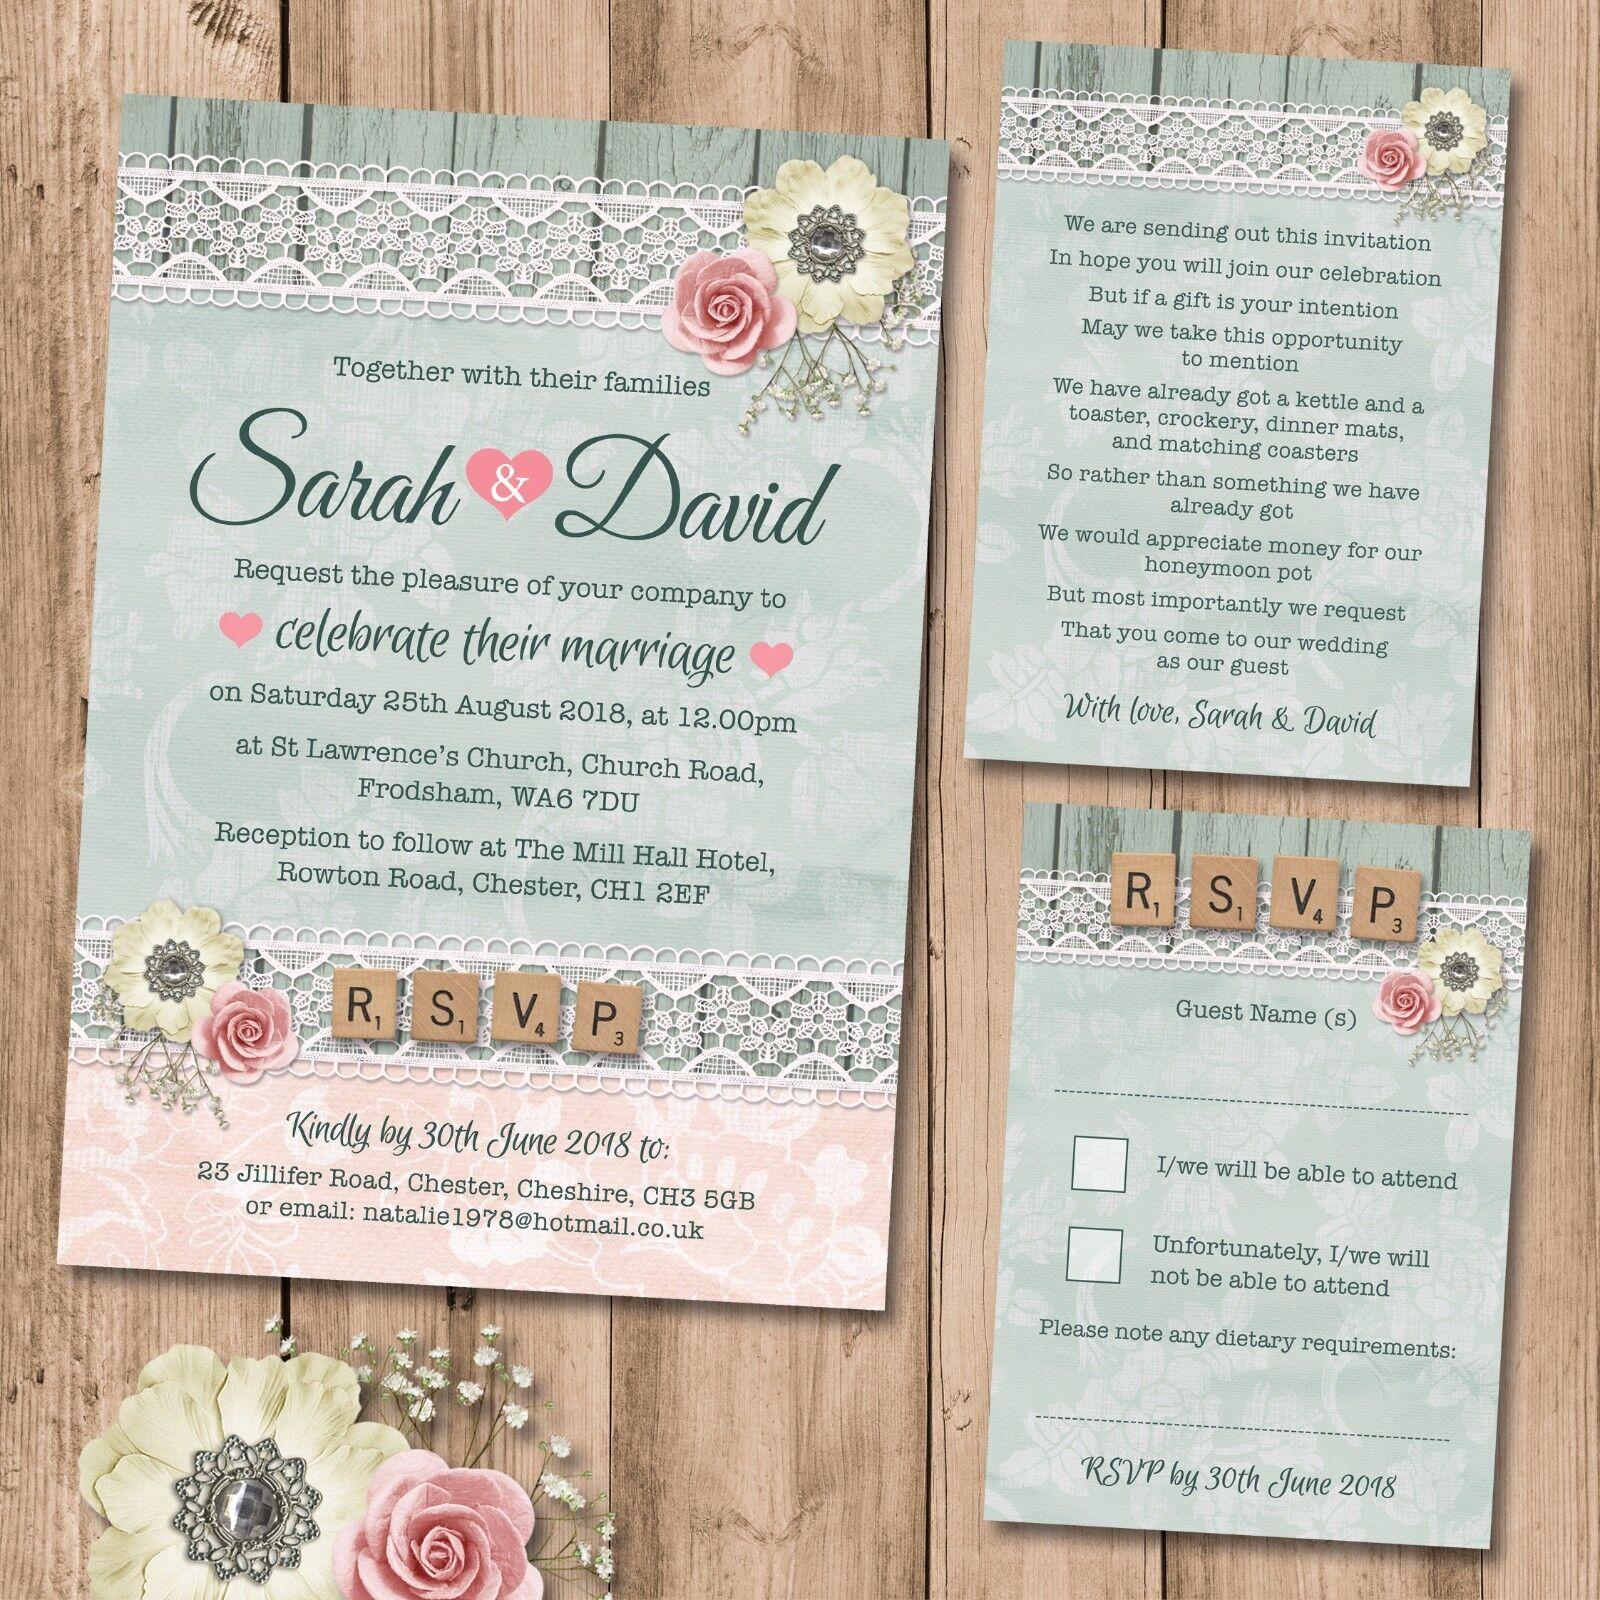 Wedding Invitation Gift: Wedding Invitation, RSVP And Gift Poem